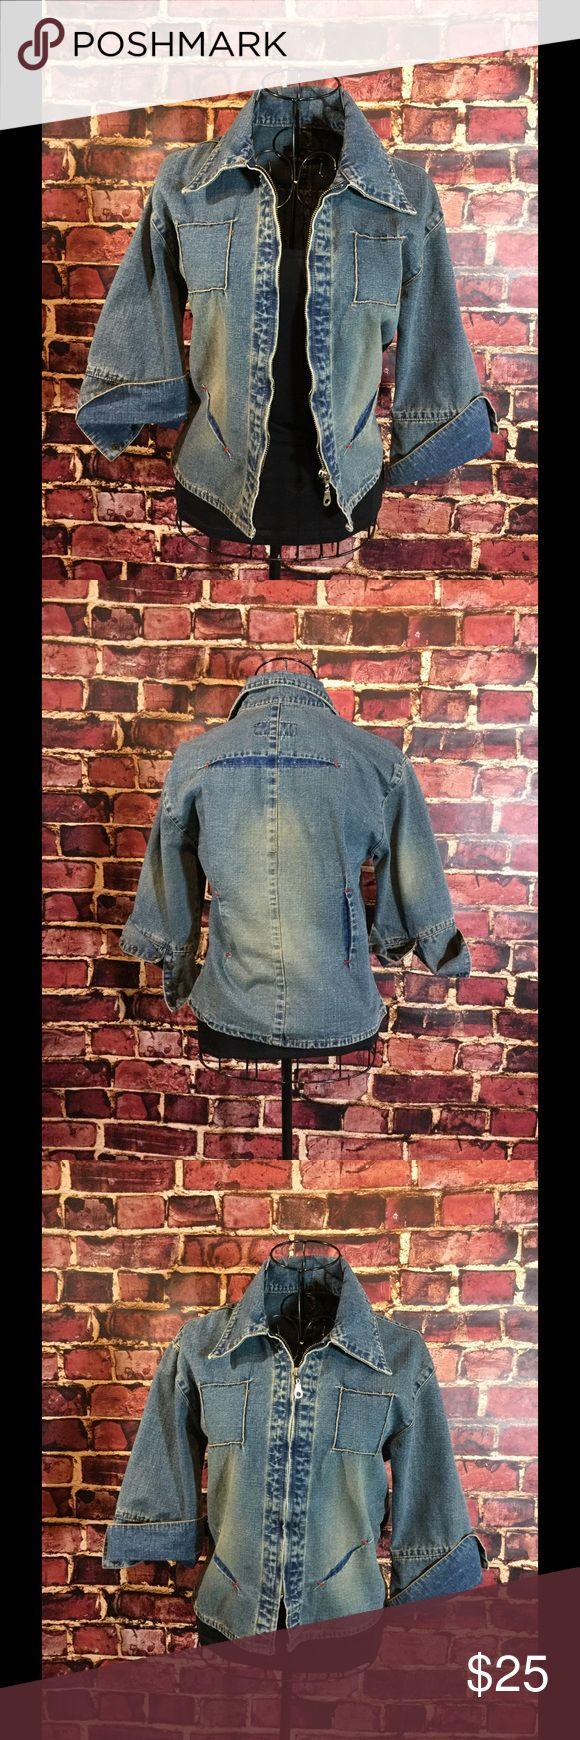 Diesel denim jacket Super fun, unique denim jacket. Size medium but fits like a small Diesel Jackets & Coats Jean Jackets